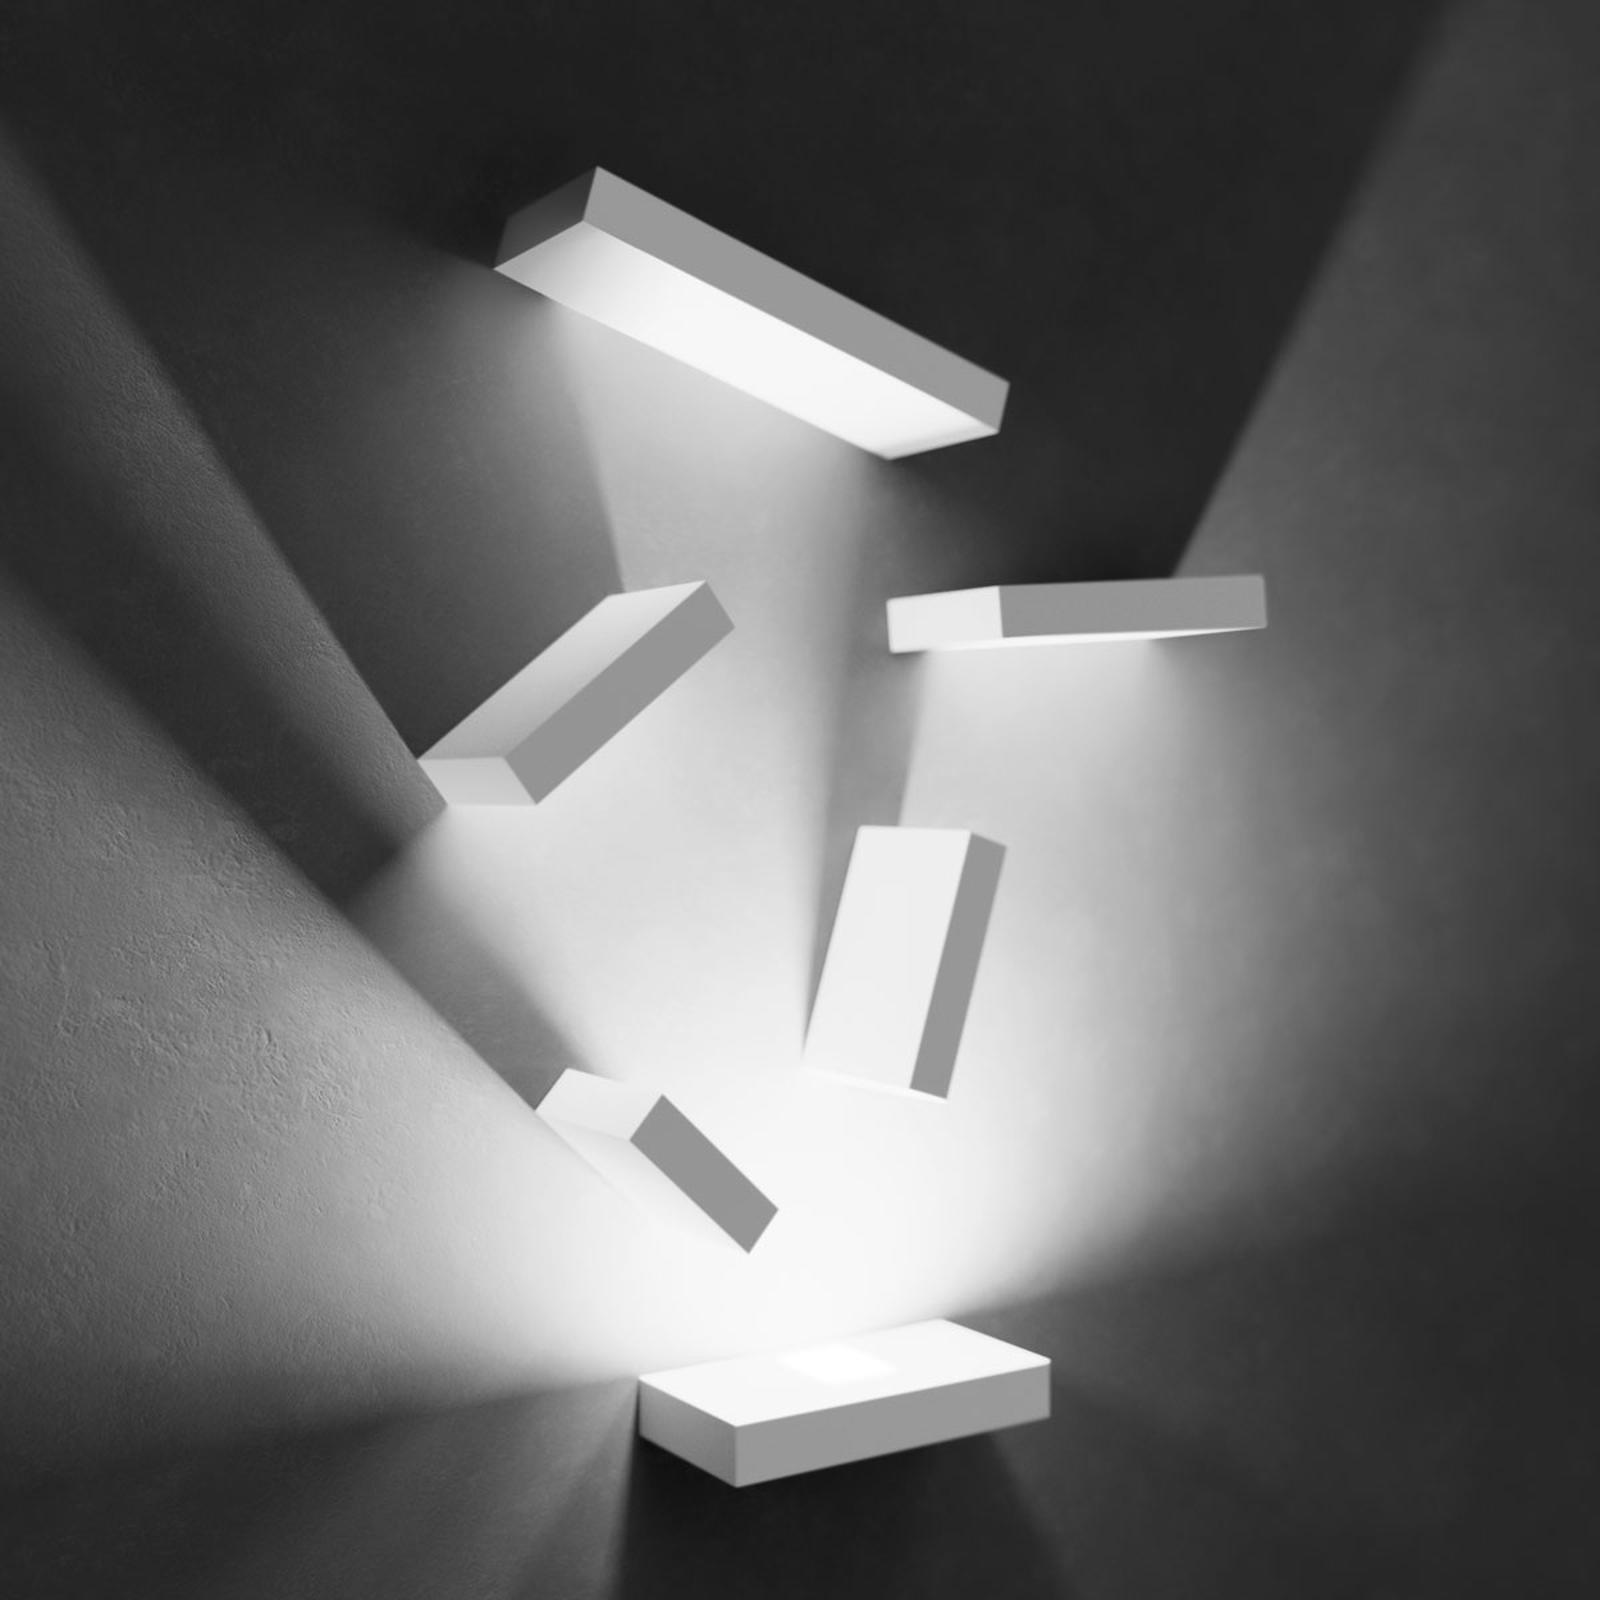 Acquista Affascinante applique LED Set